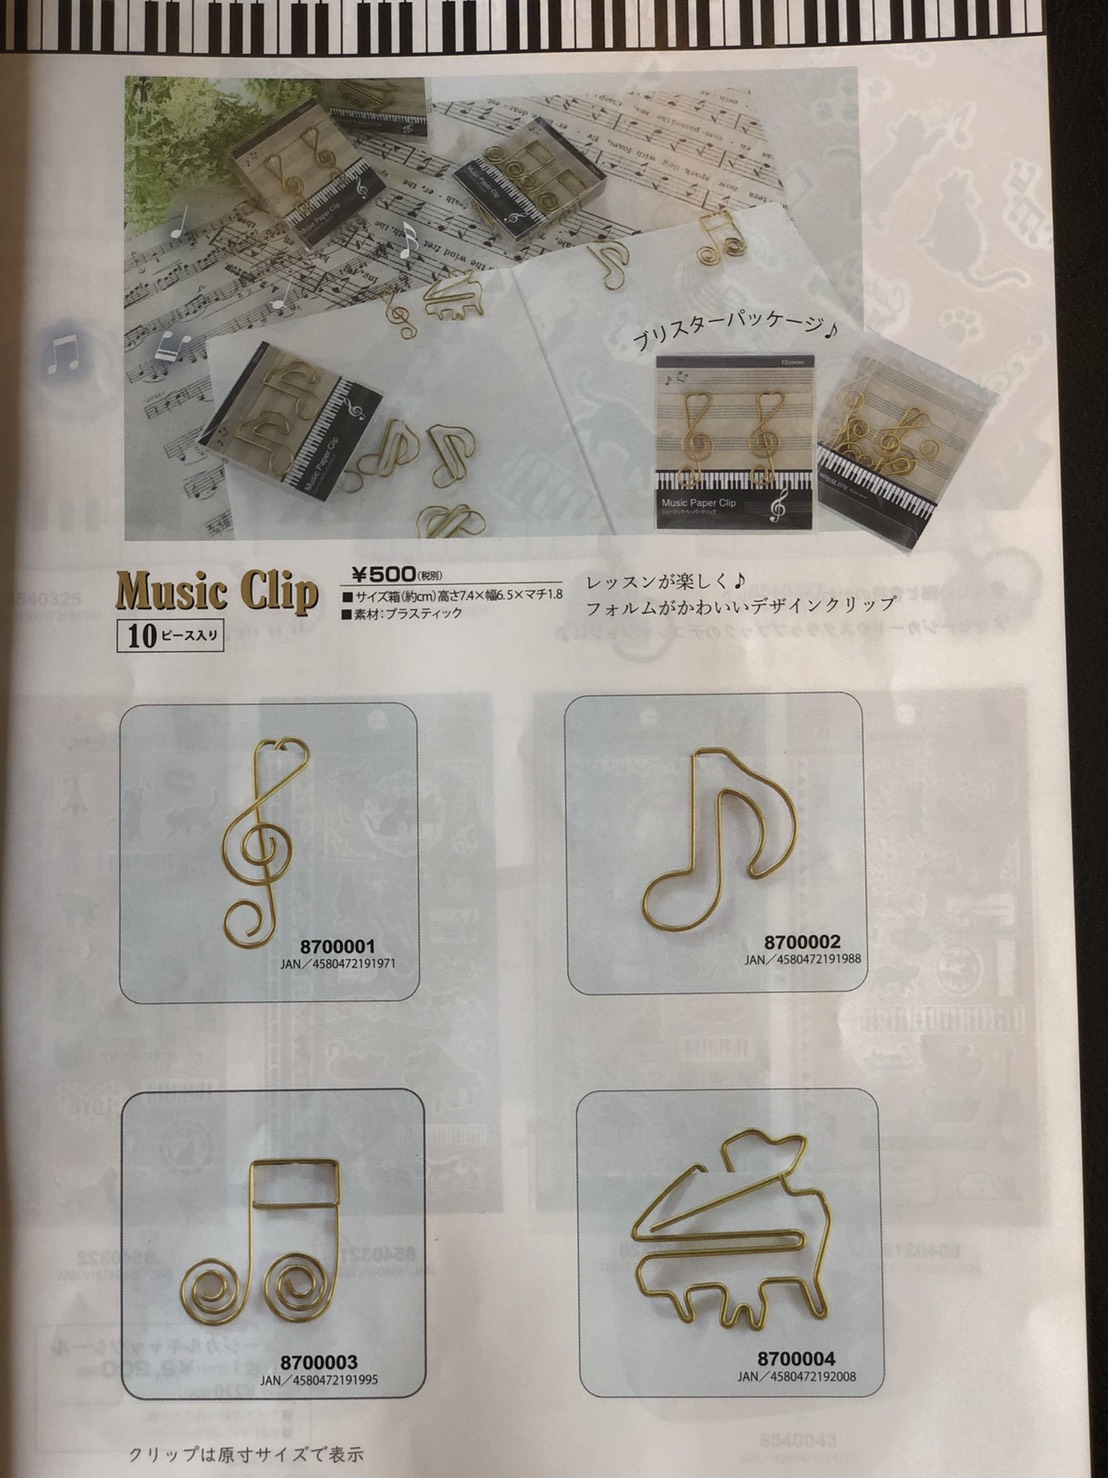 Music Clip※お取り寄せ商品 引き出物 記念品 音楽雑貨 音符 ピアノモチーフ ト音記号 ピアノ雑貨